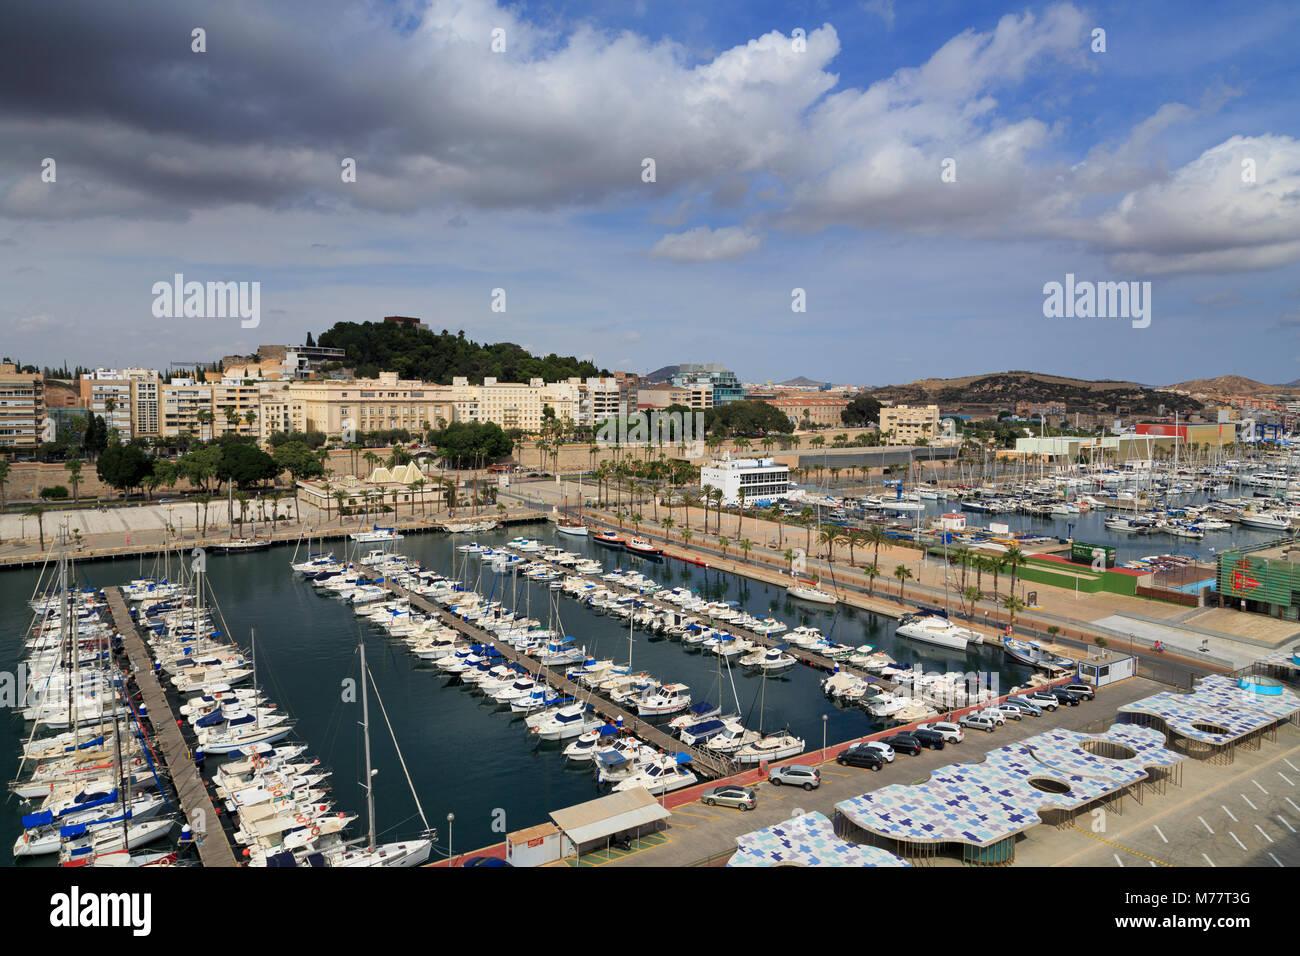 Yacht Marina, Cartagena, Murcia, Spanien, Europa Stockbild